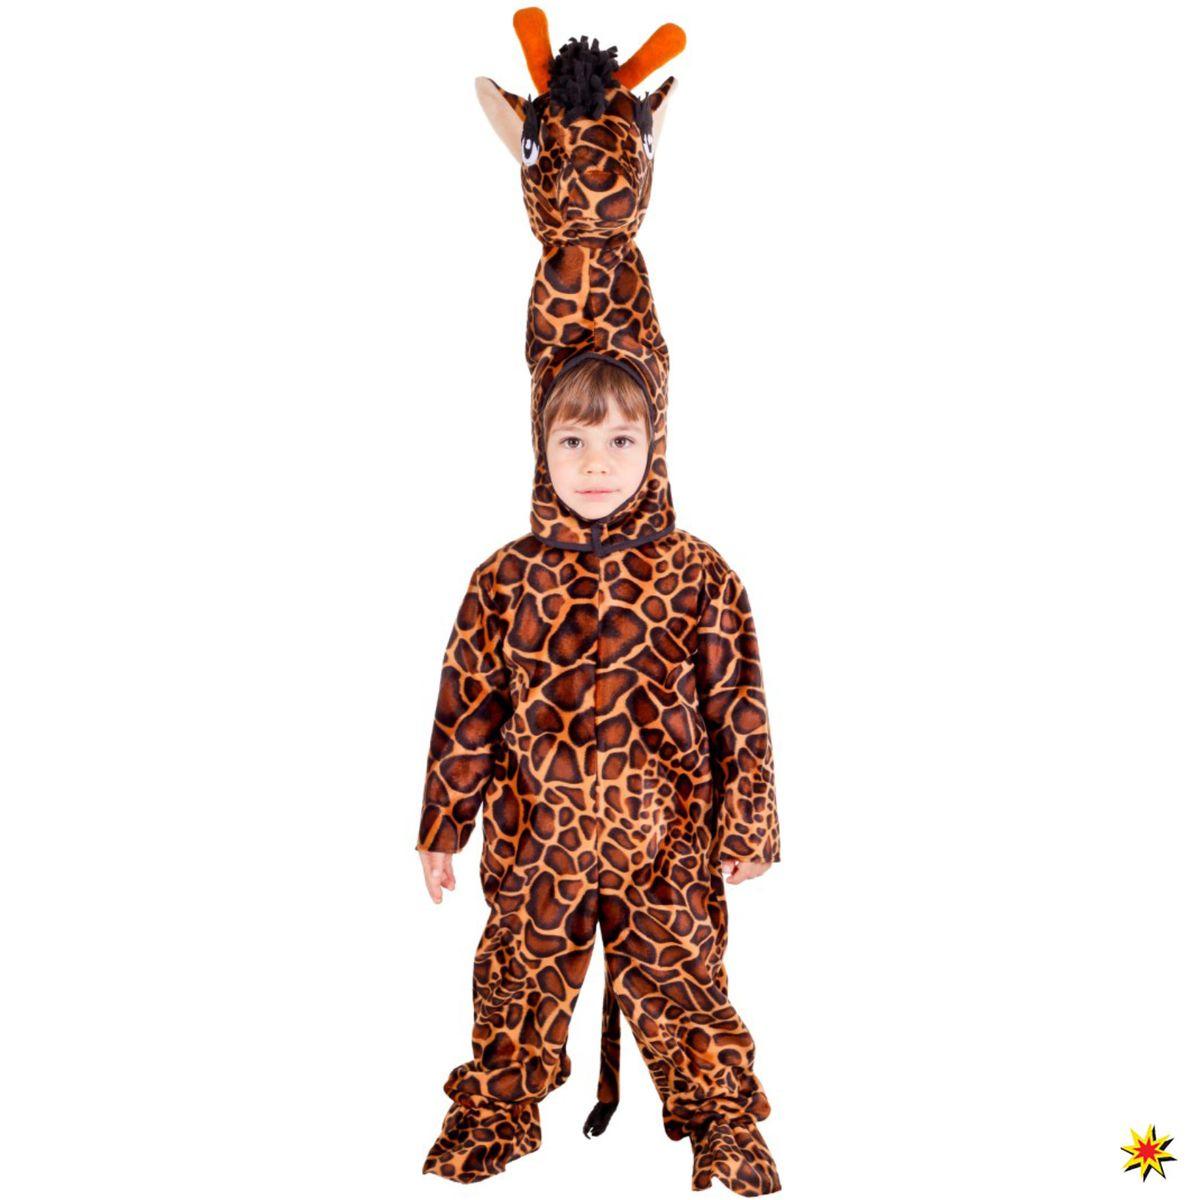 Kinder Kostuem Giraffe Flecki 1